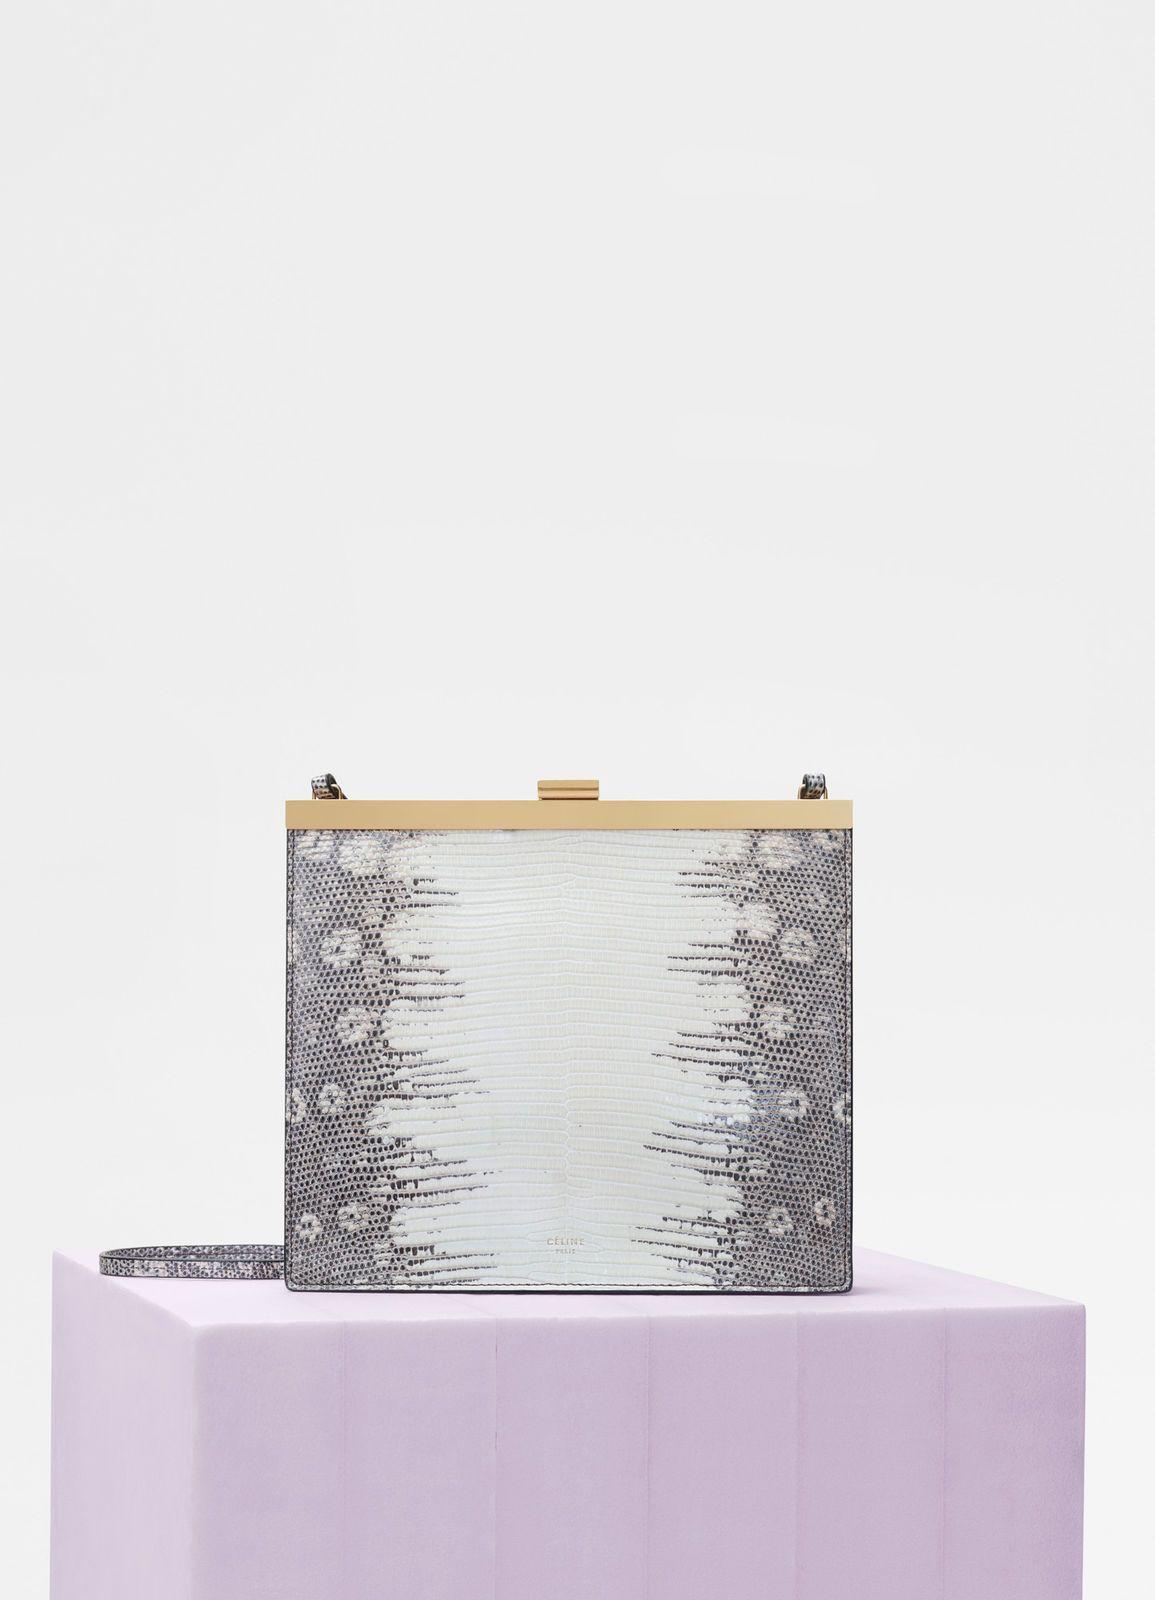 ff87f29a0c47 Mini Clasp bag in lizard | CÉLINE | bag inspriation | Bags, Mini, Summer